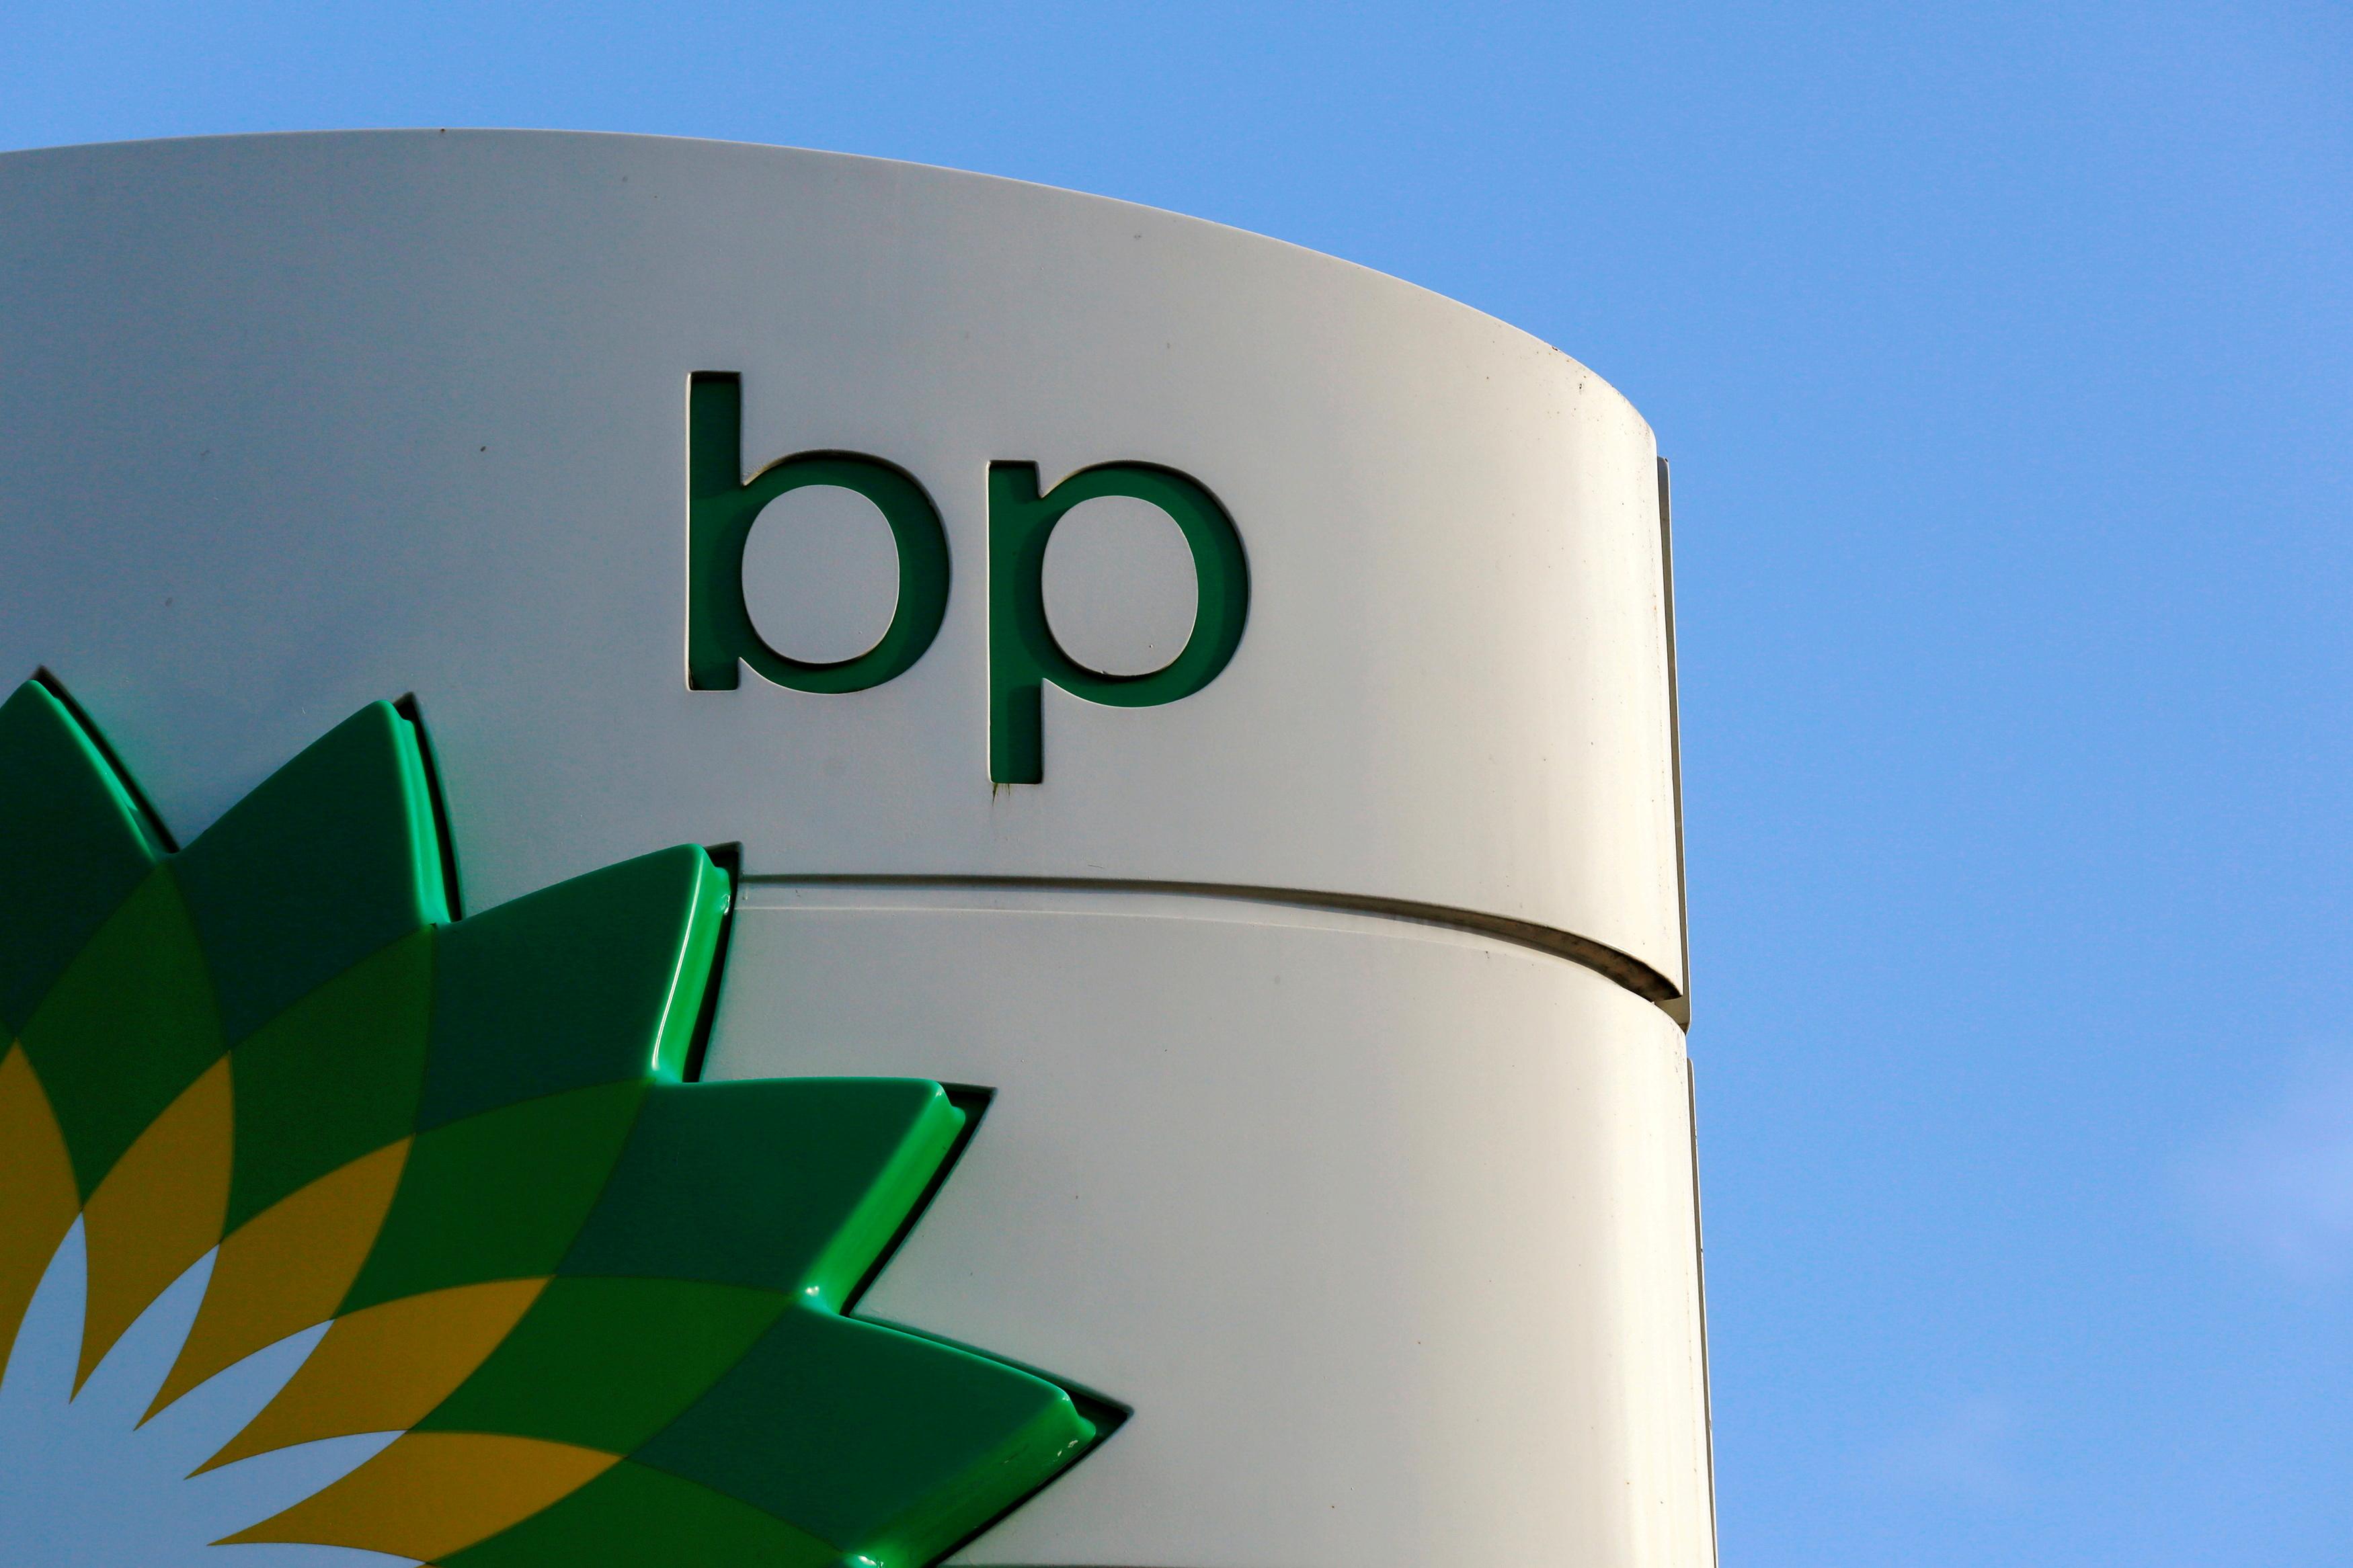 A BP logo is seen at a petrol station in London, Britain January 15, 2015.   REUTERS/Luke MacGregor